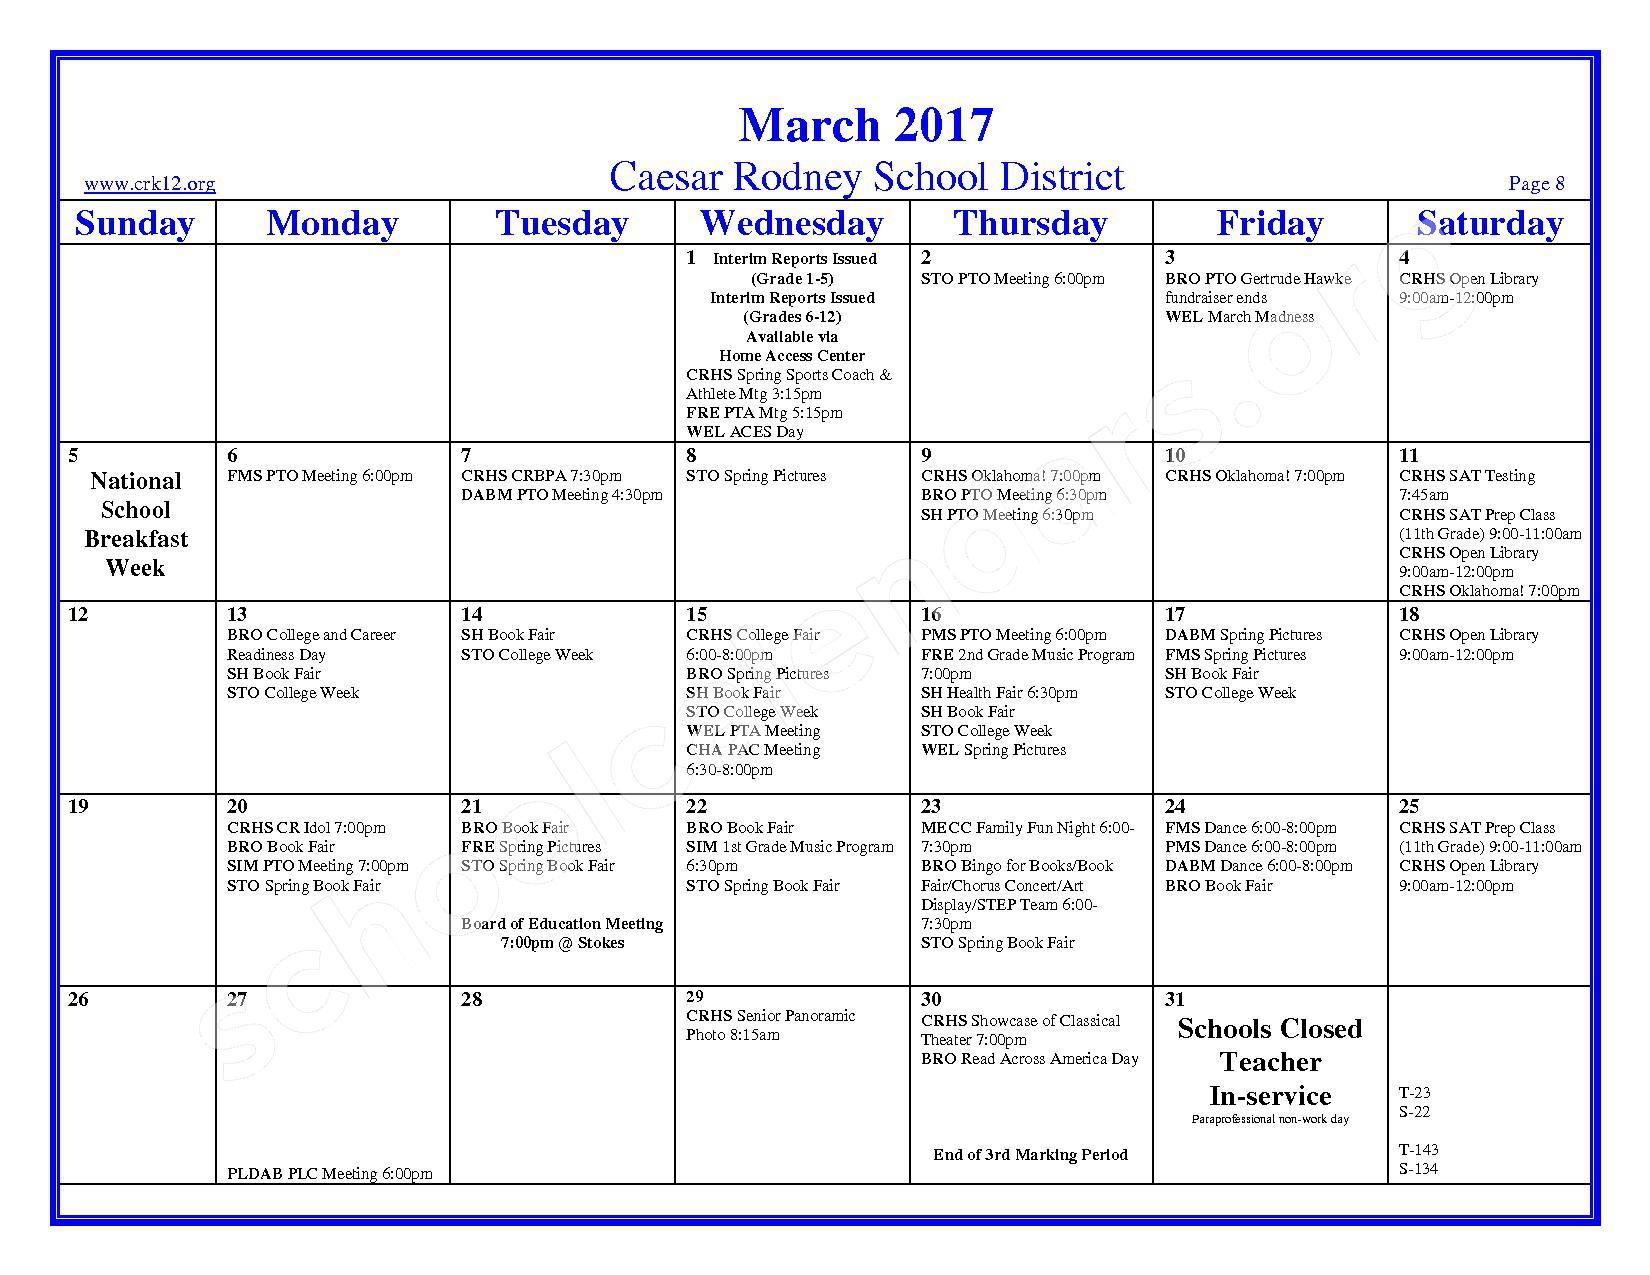 2016 - 2017 School Calendar – Brown (W. Reily) Elementary School – page 8